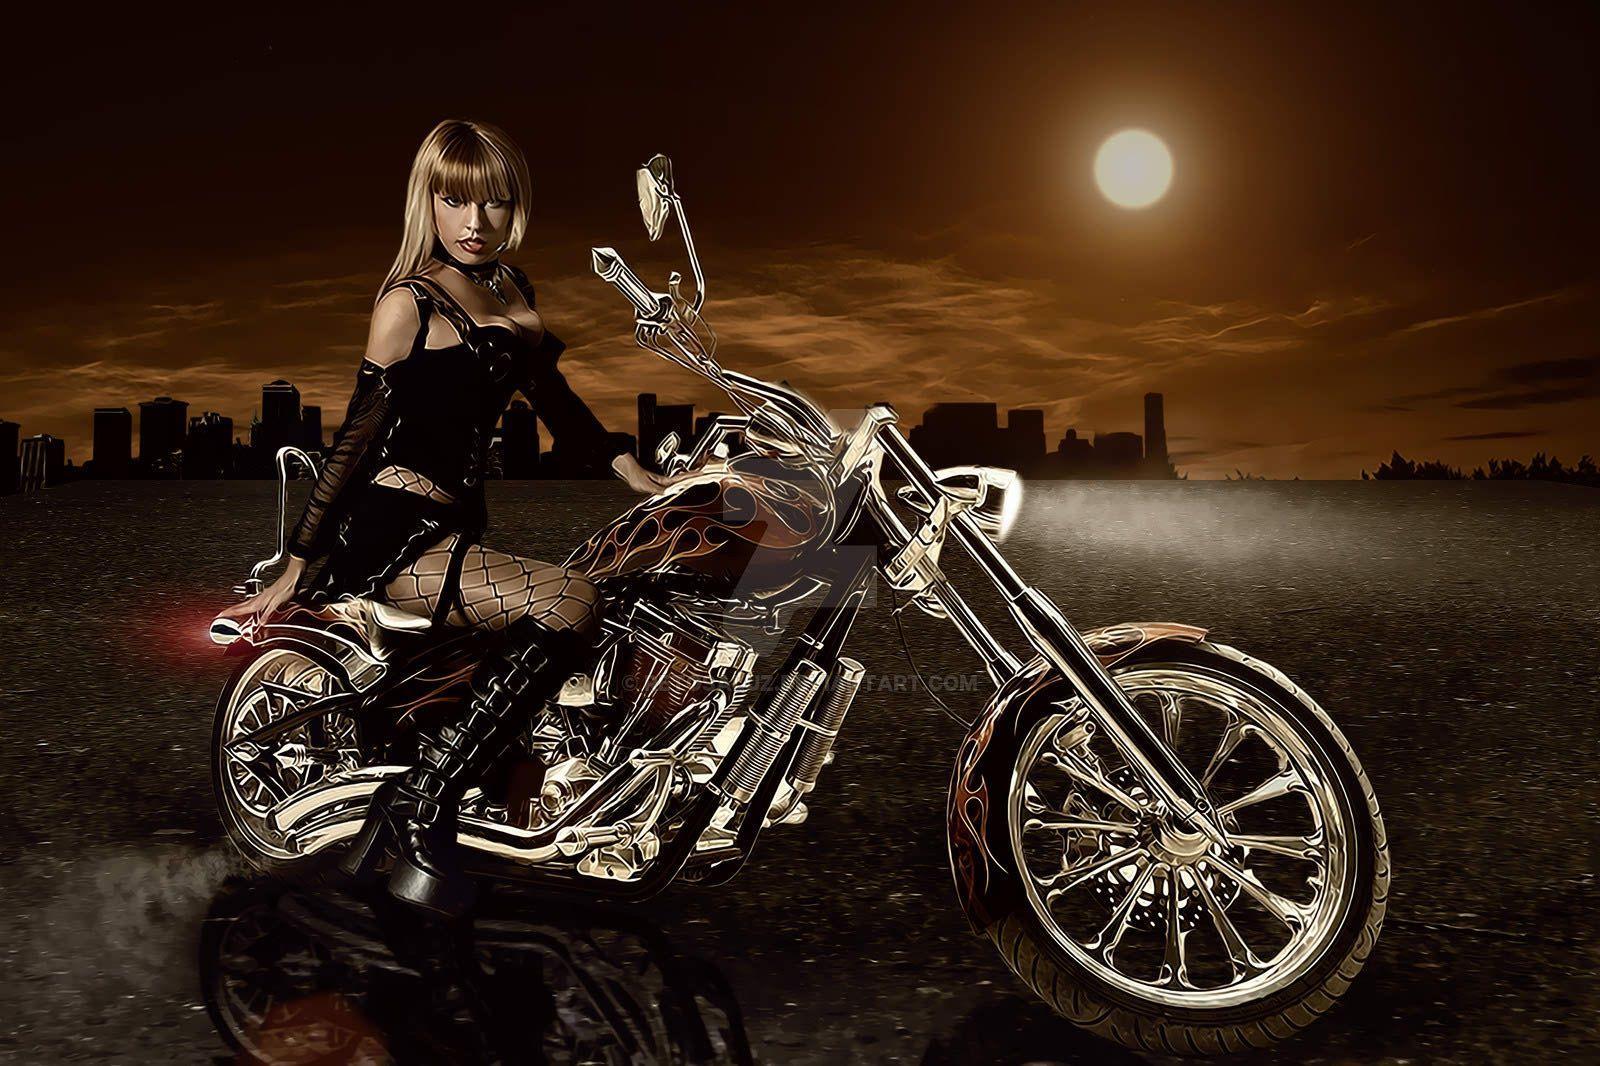 Bobber Cafe Racer Harley Davidson Hd Wallpaper 1080p: Motorcycle Art Wallpapers